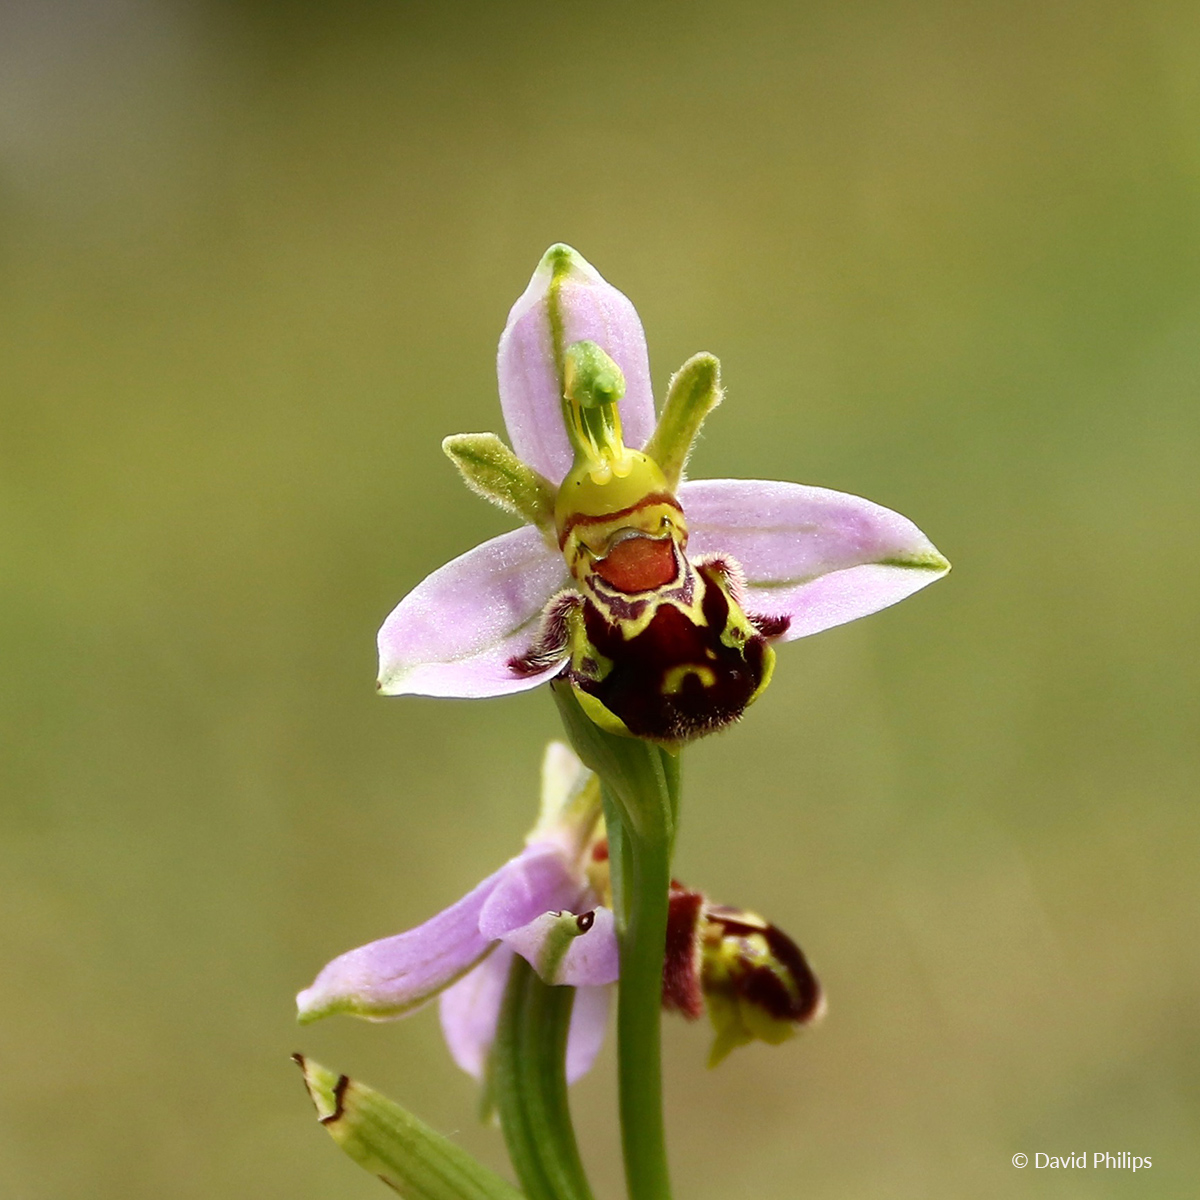 BeeOrchid DavidPhilips